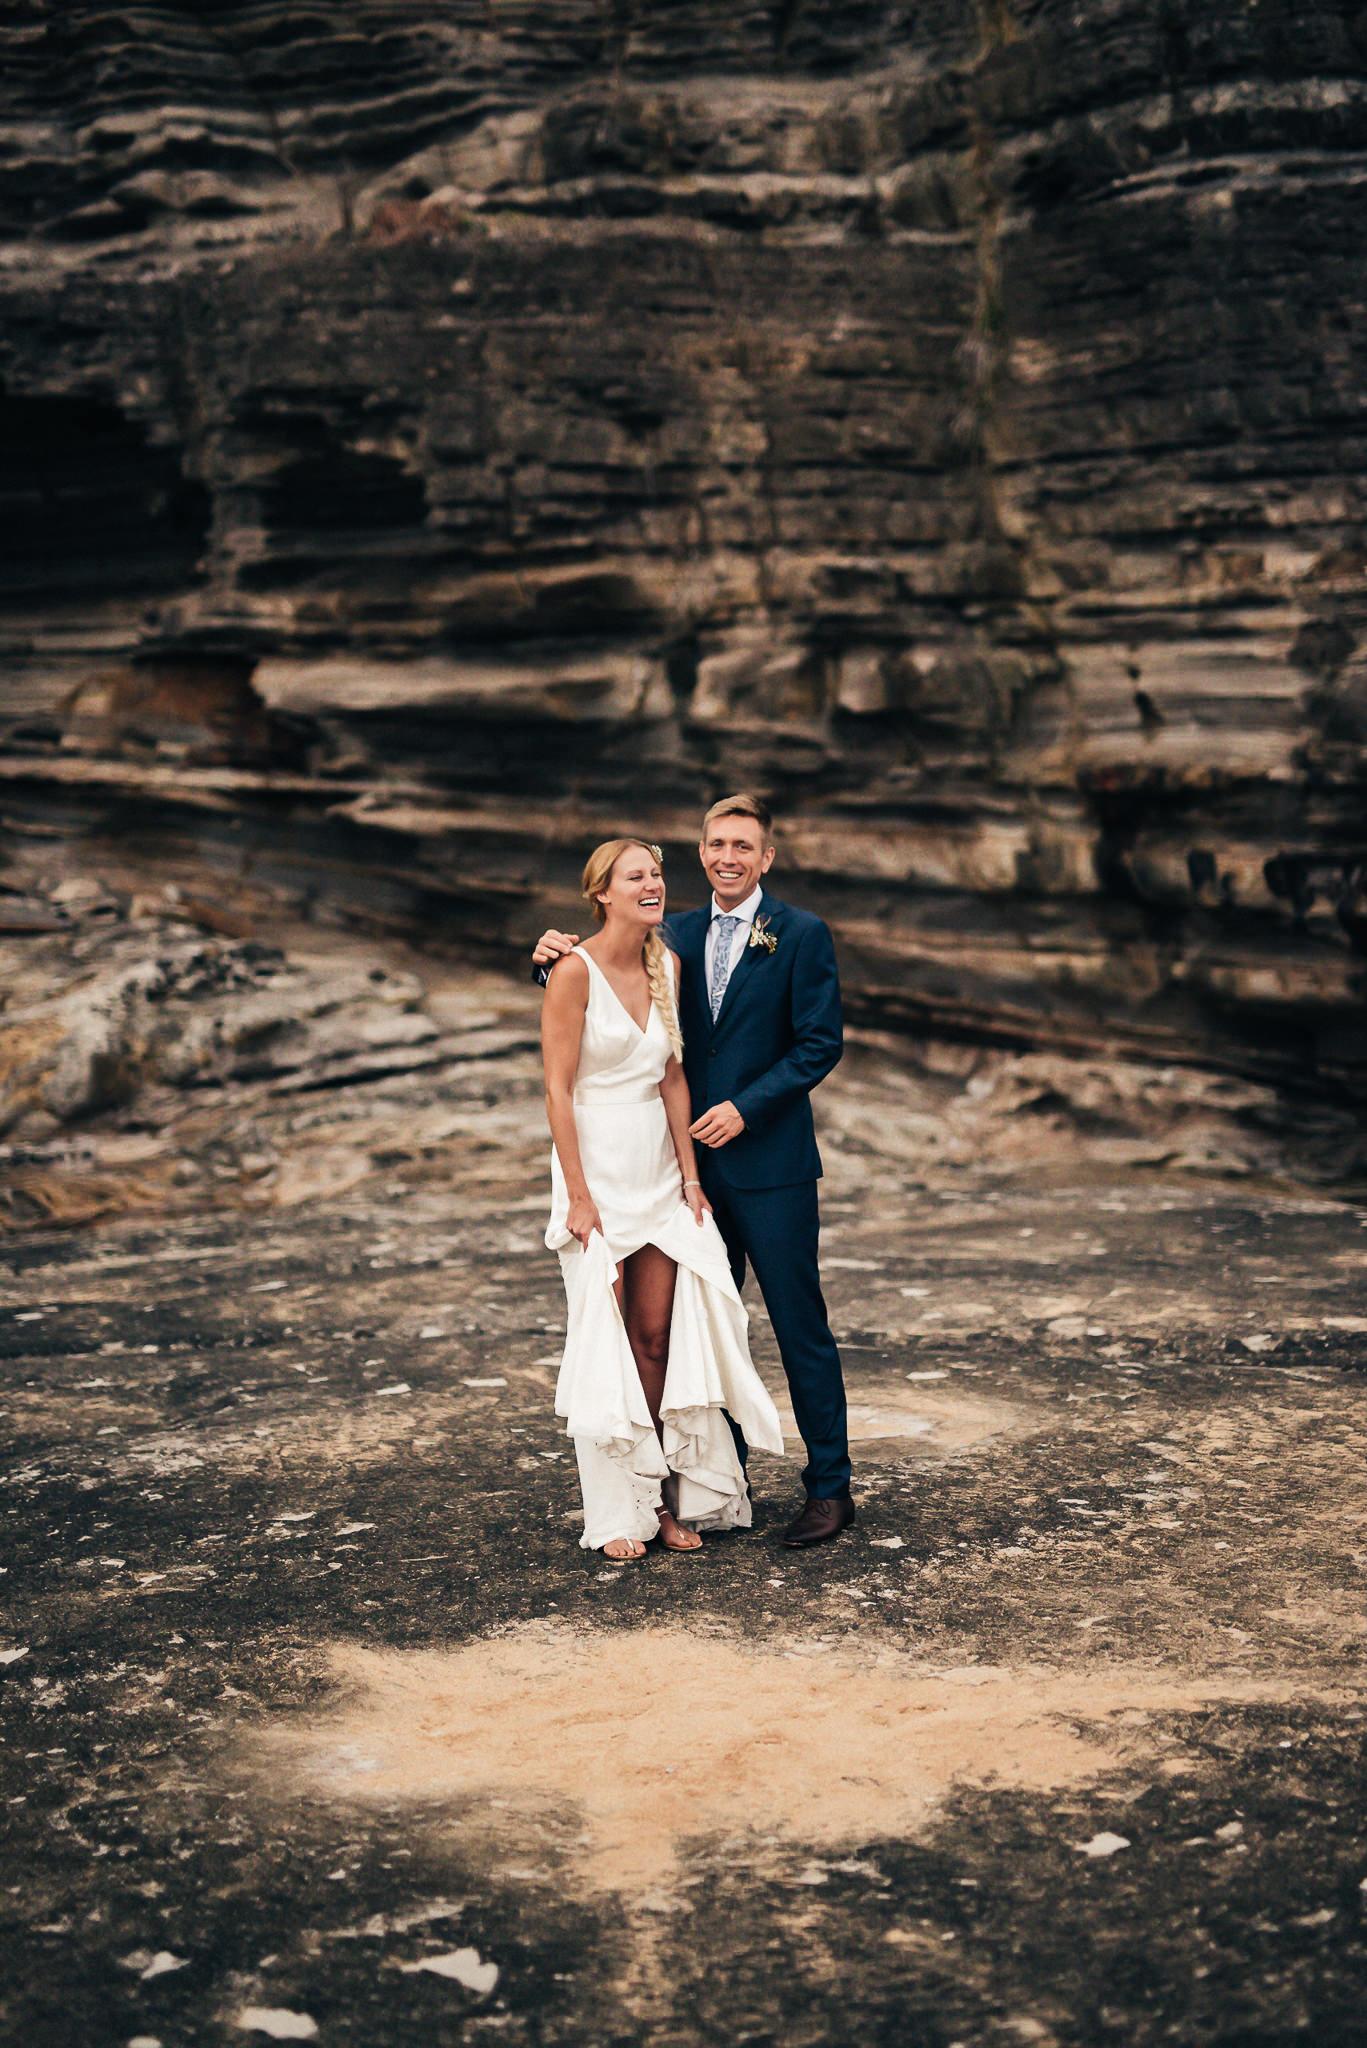 Sydney Wedding Photographer (152 of 182).jpg